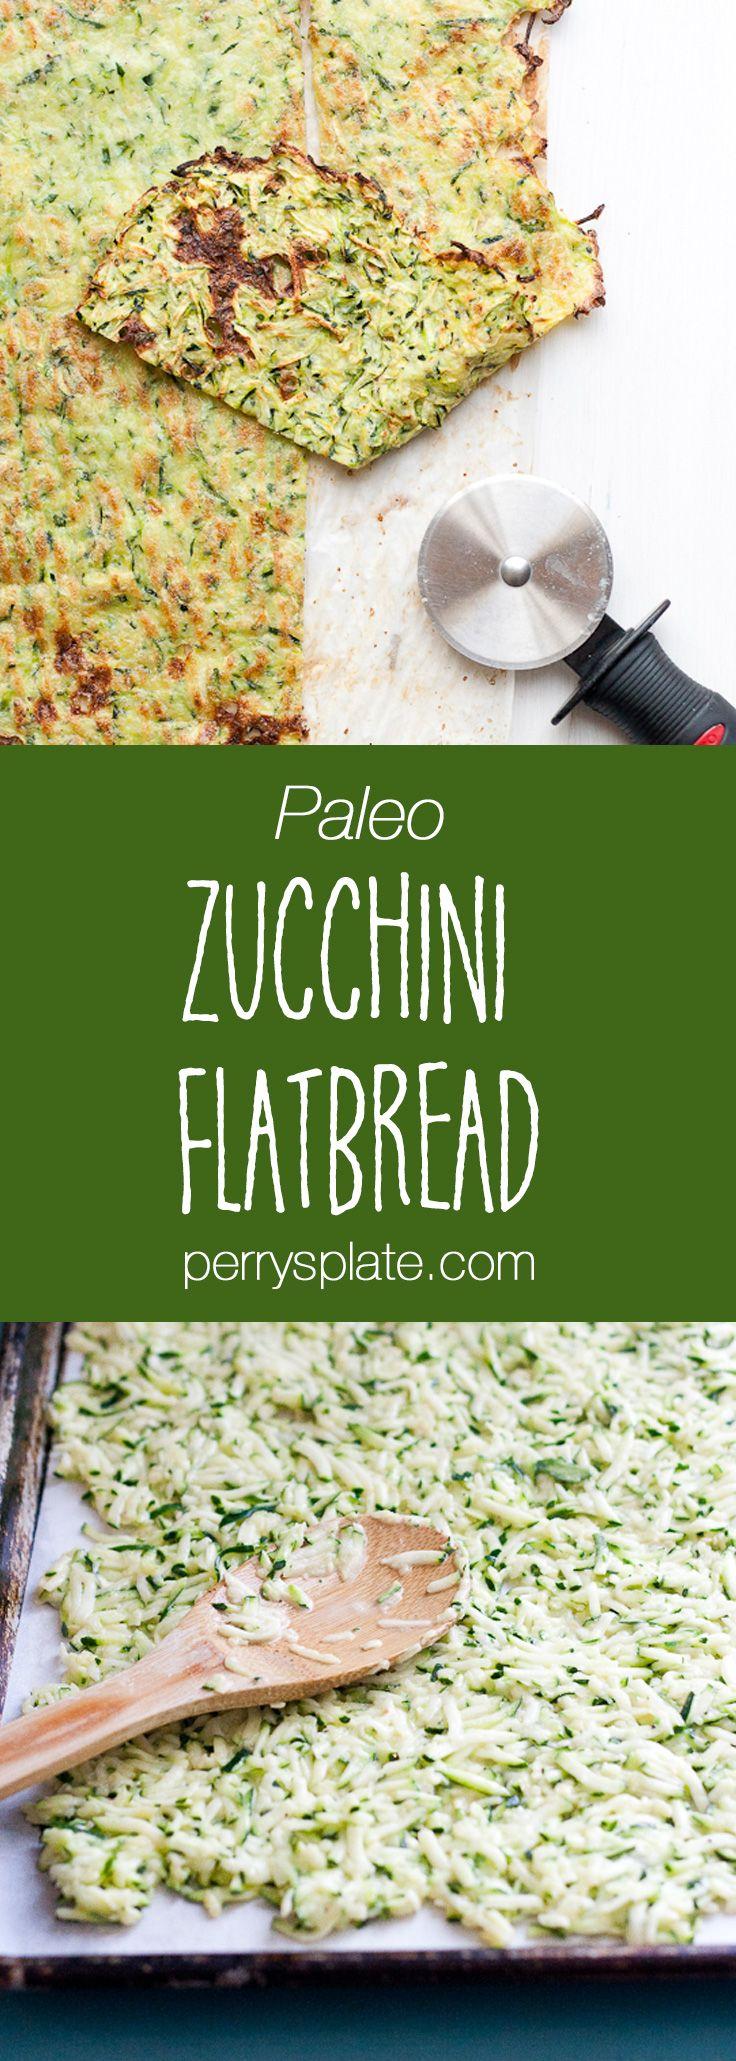 Paleo Zucchini Flatbread - Perry's Plate